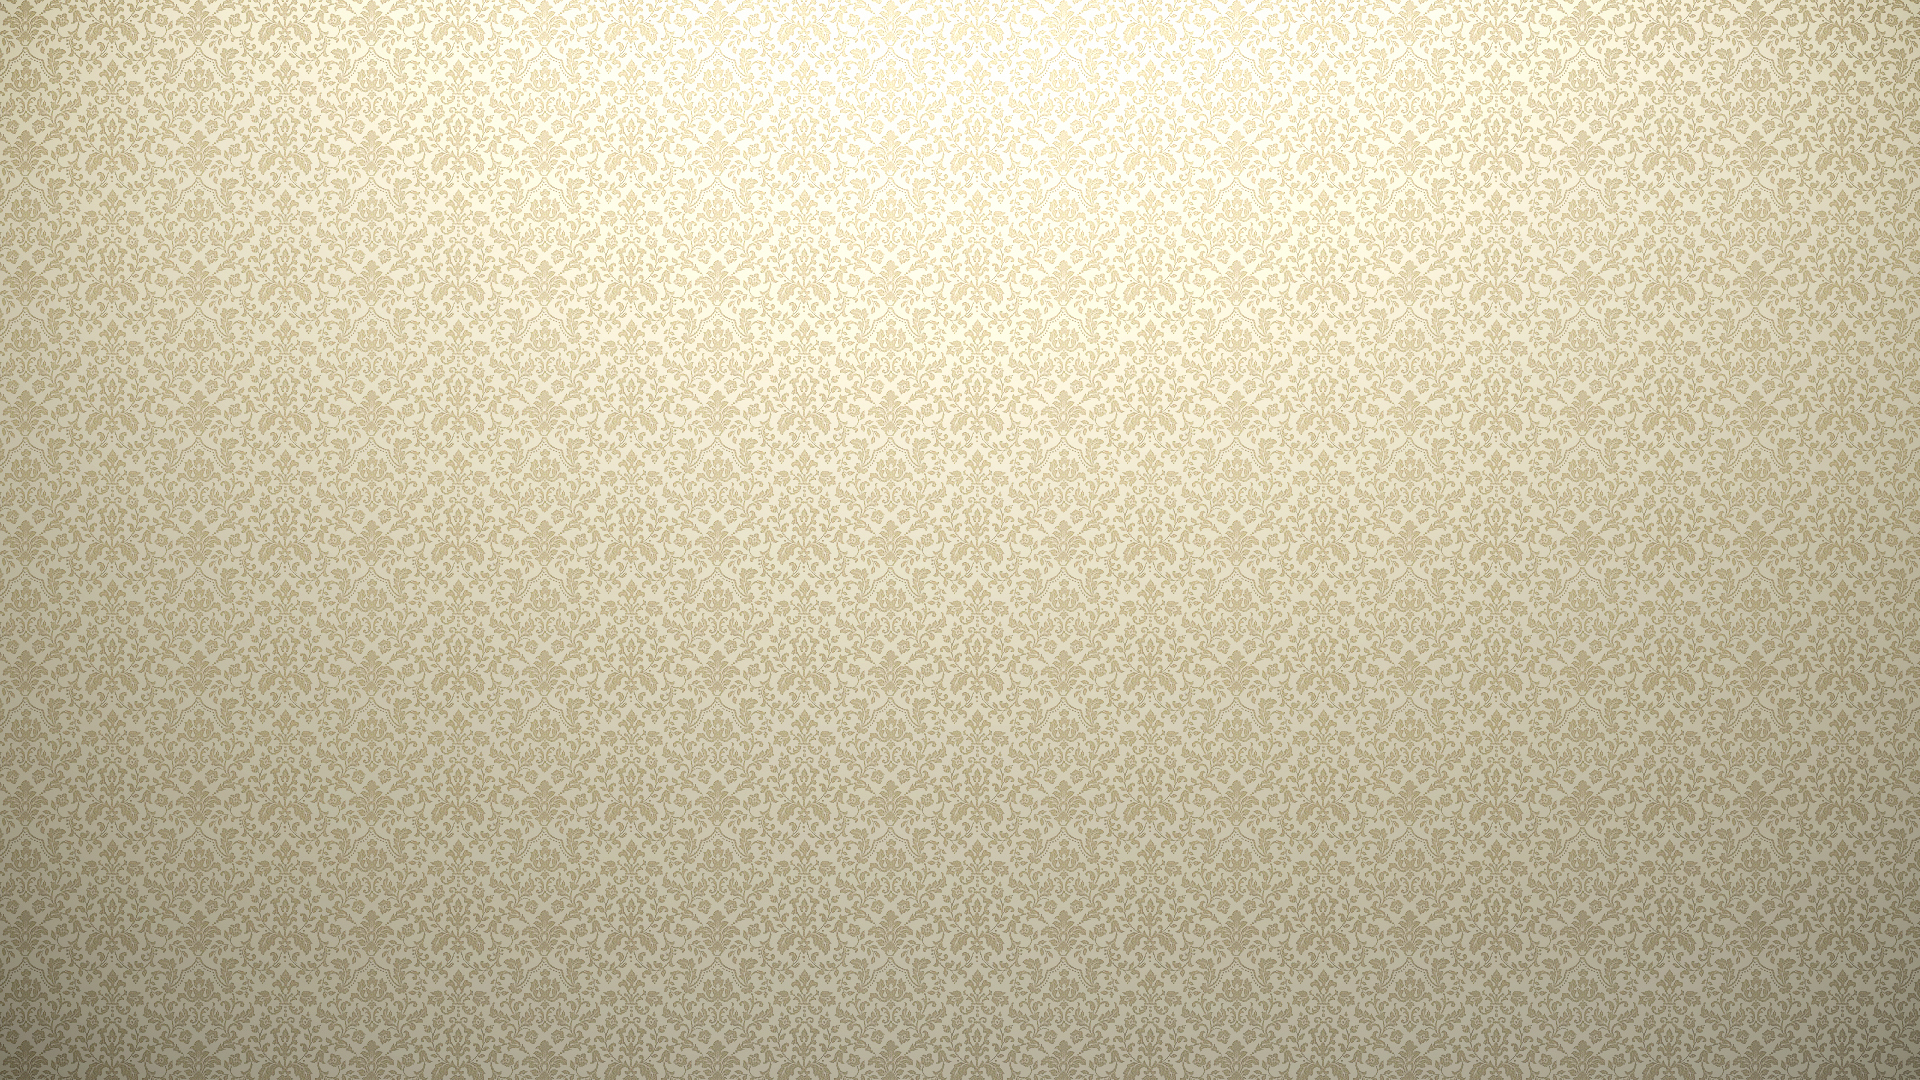 damask pattern wallpaper 2 by alitalahi customization wallpaper tiles 1920x1080